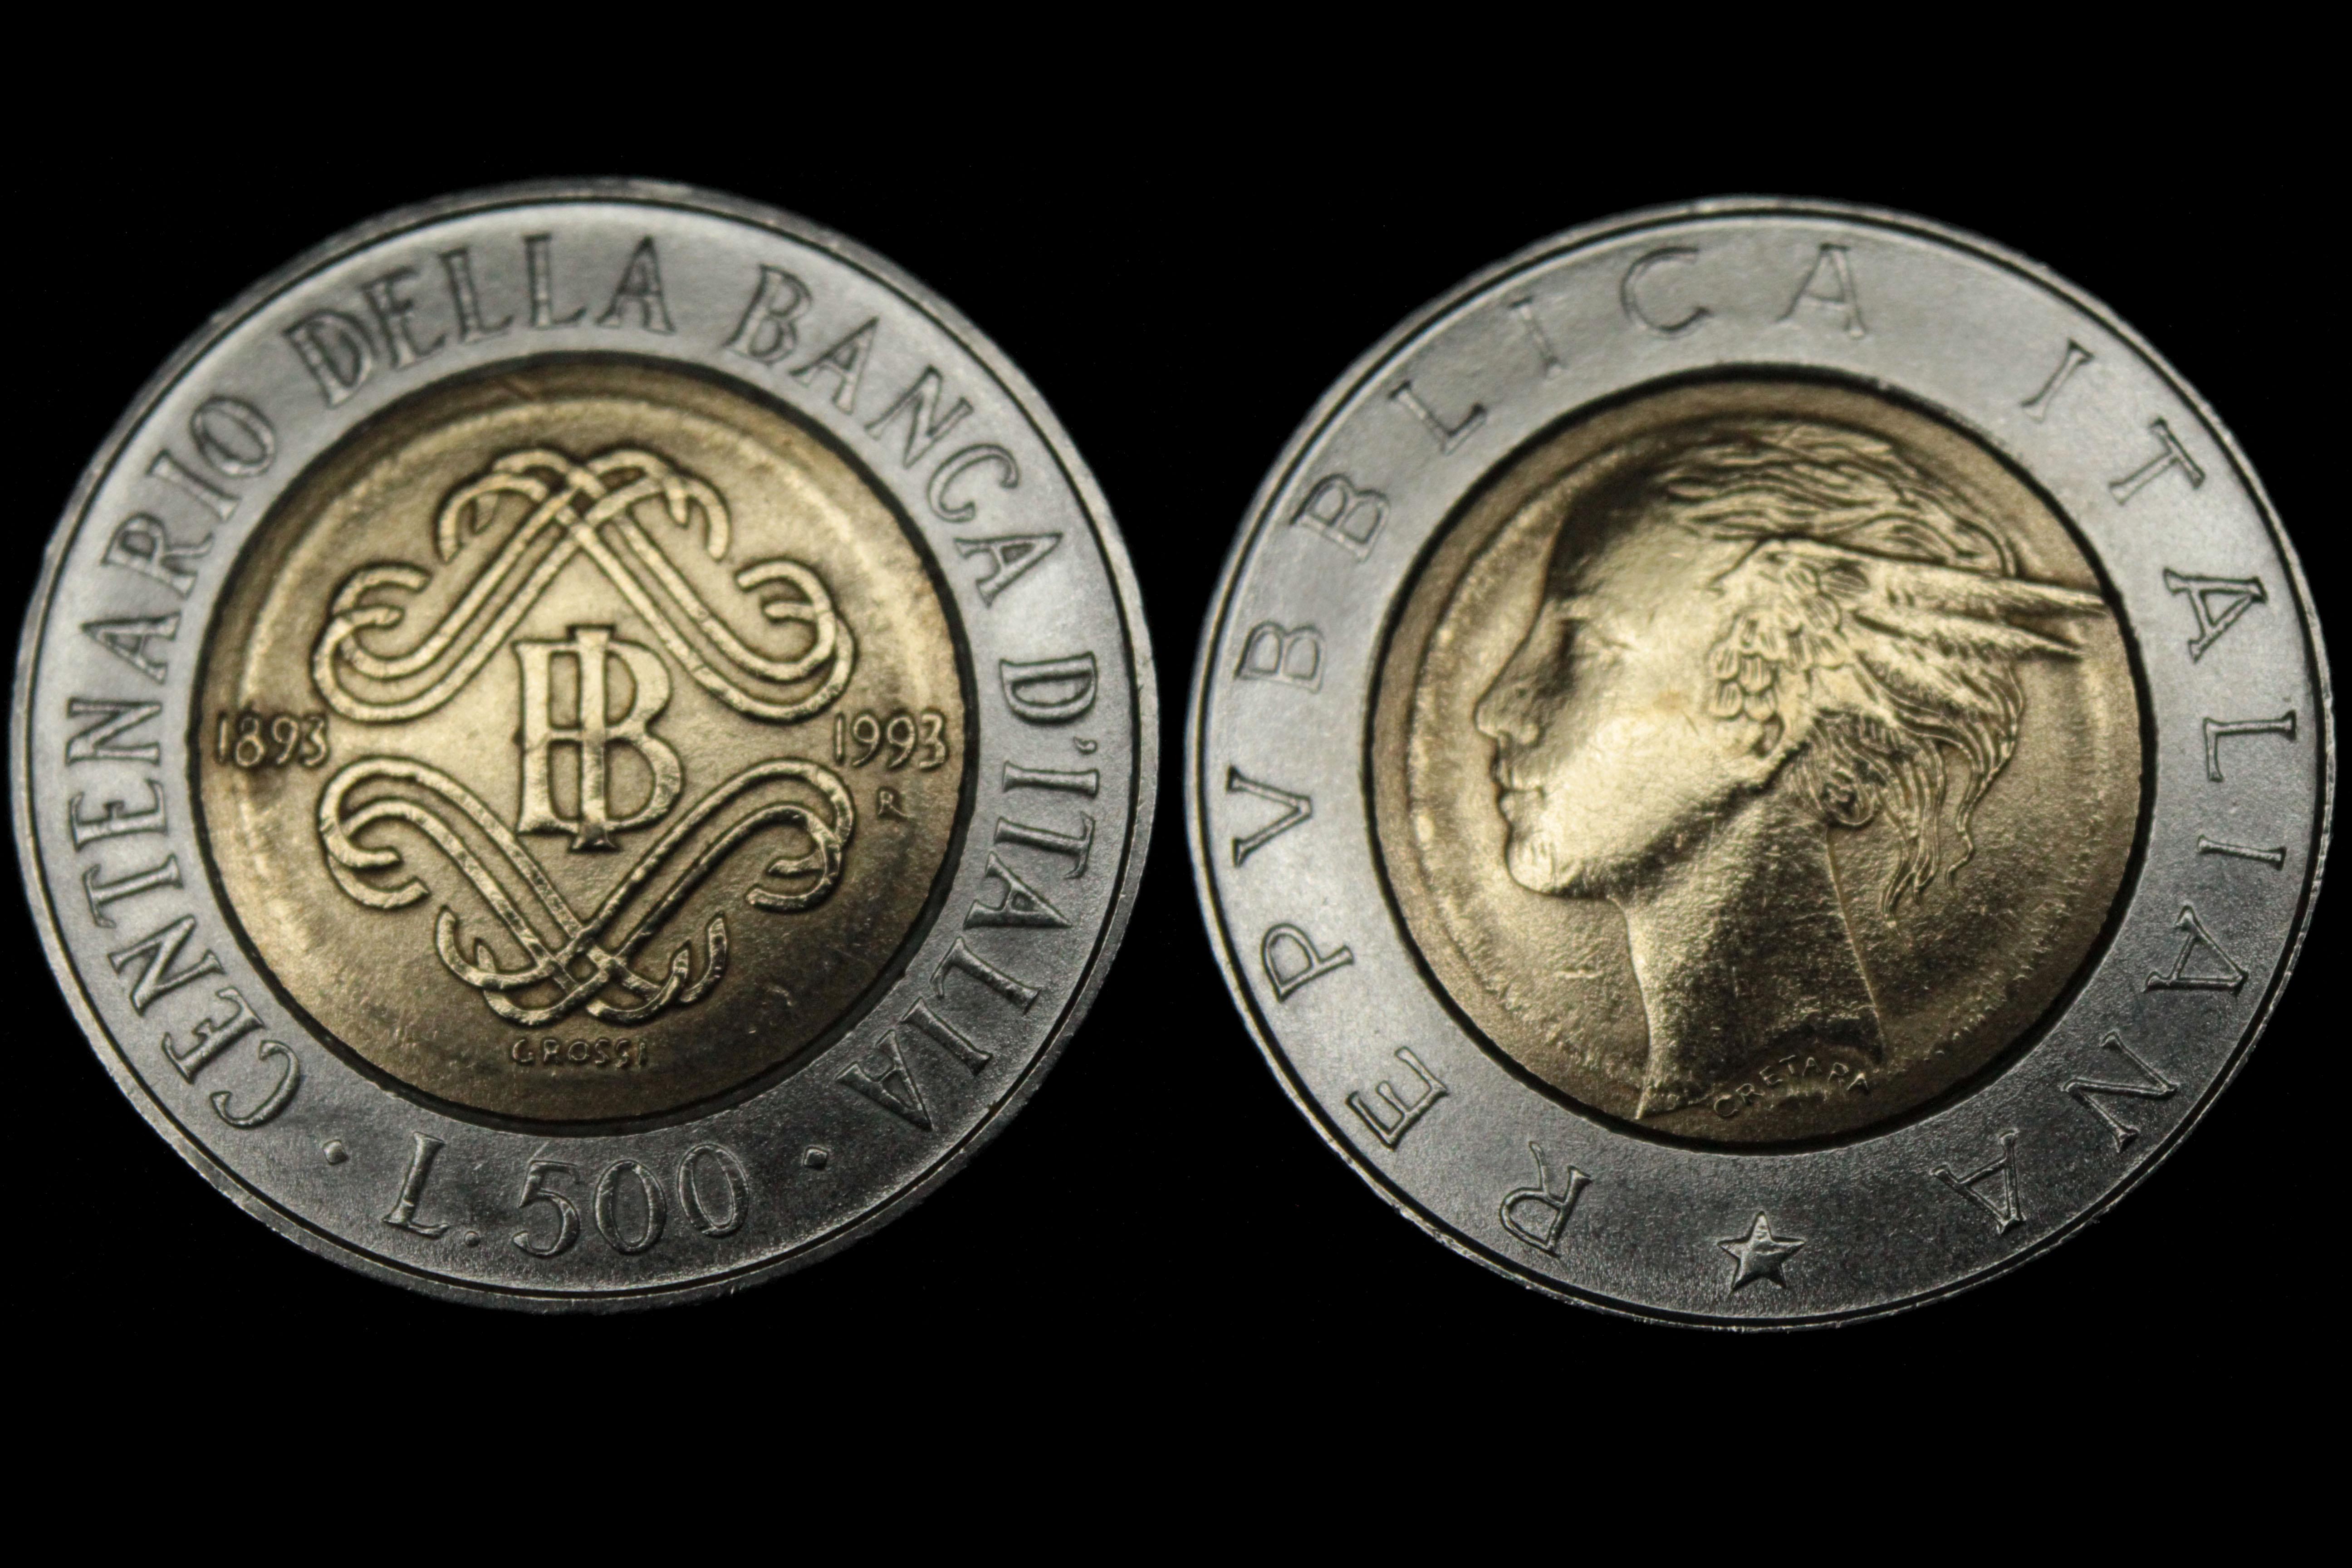 500 lire valore